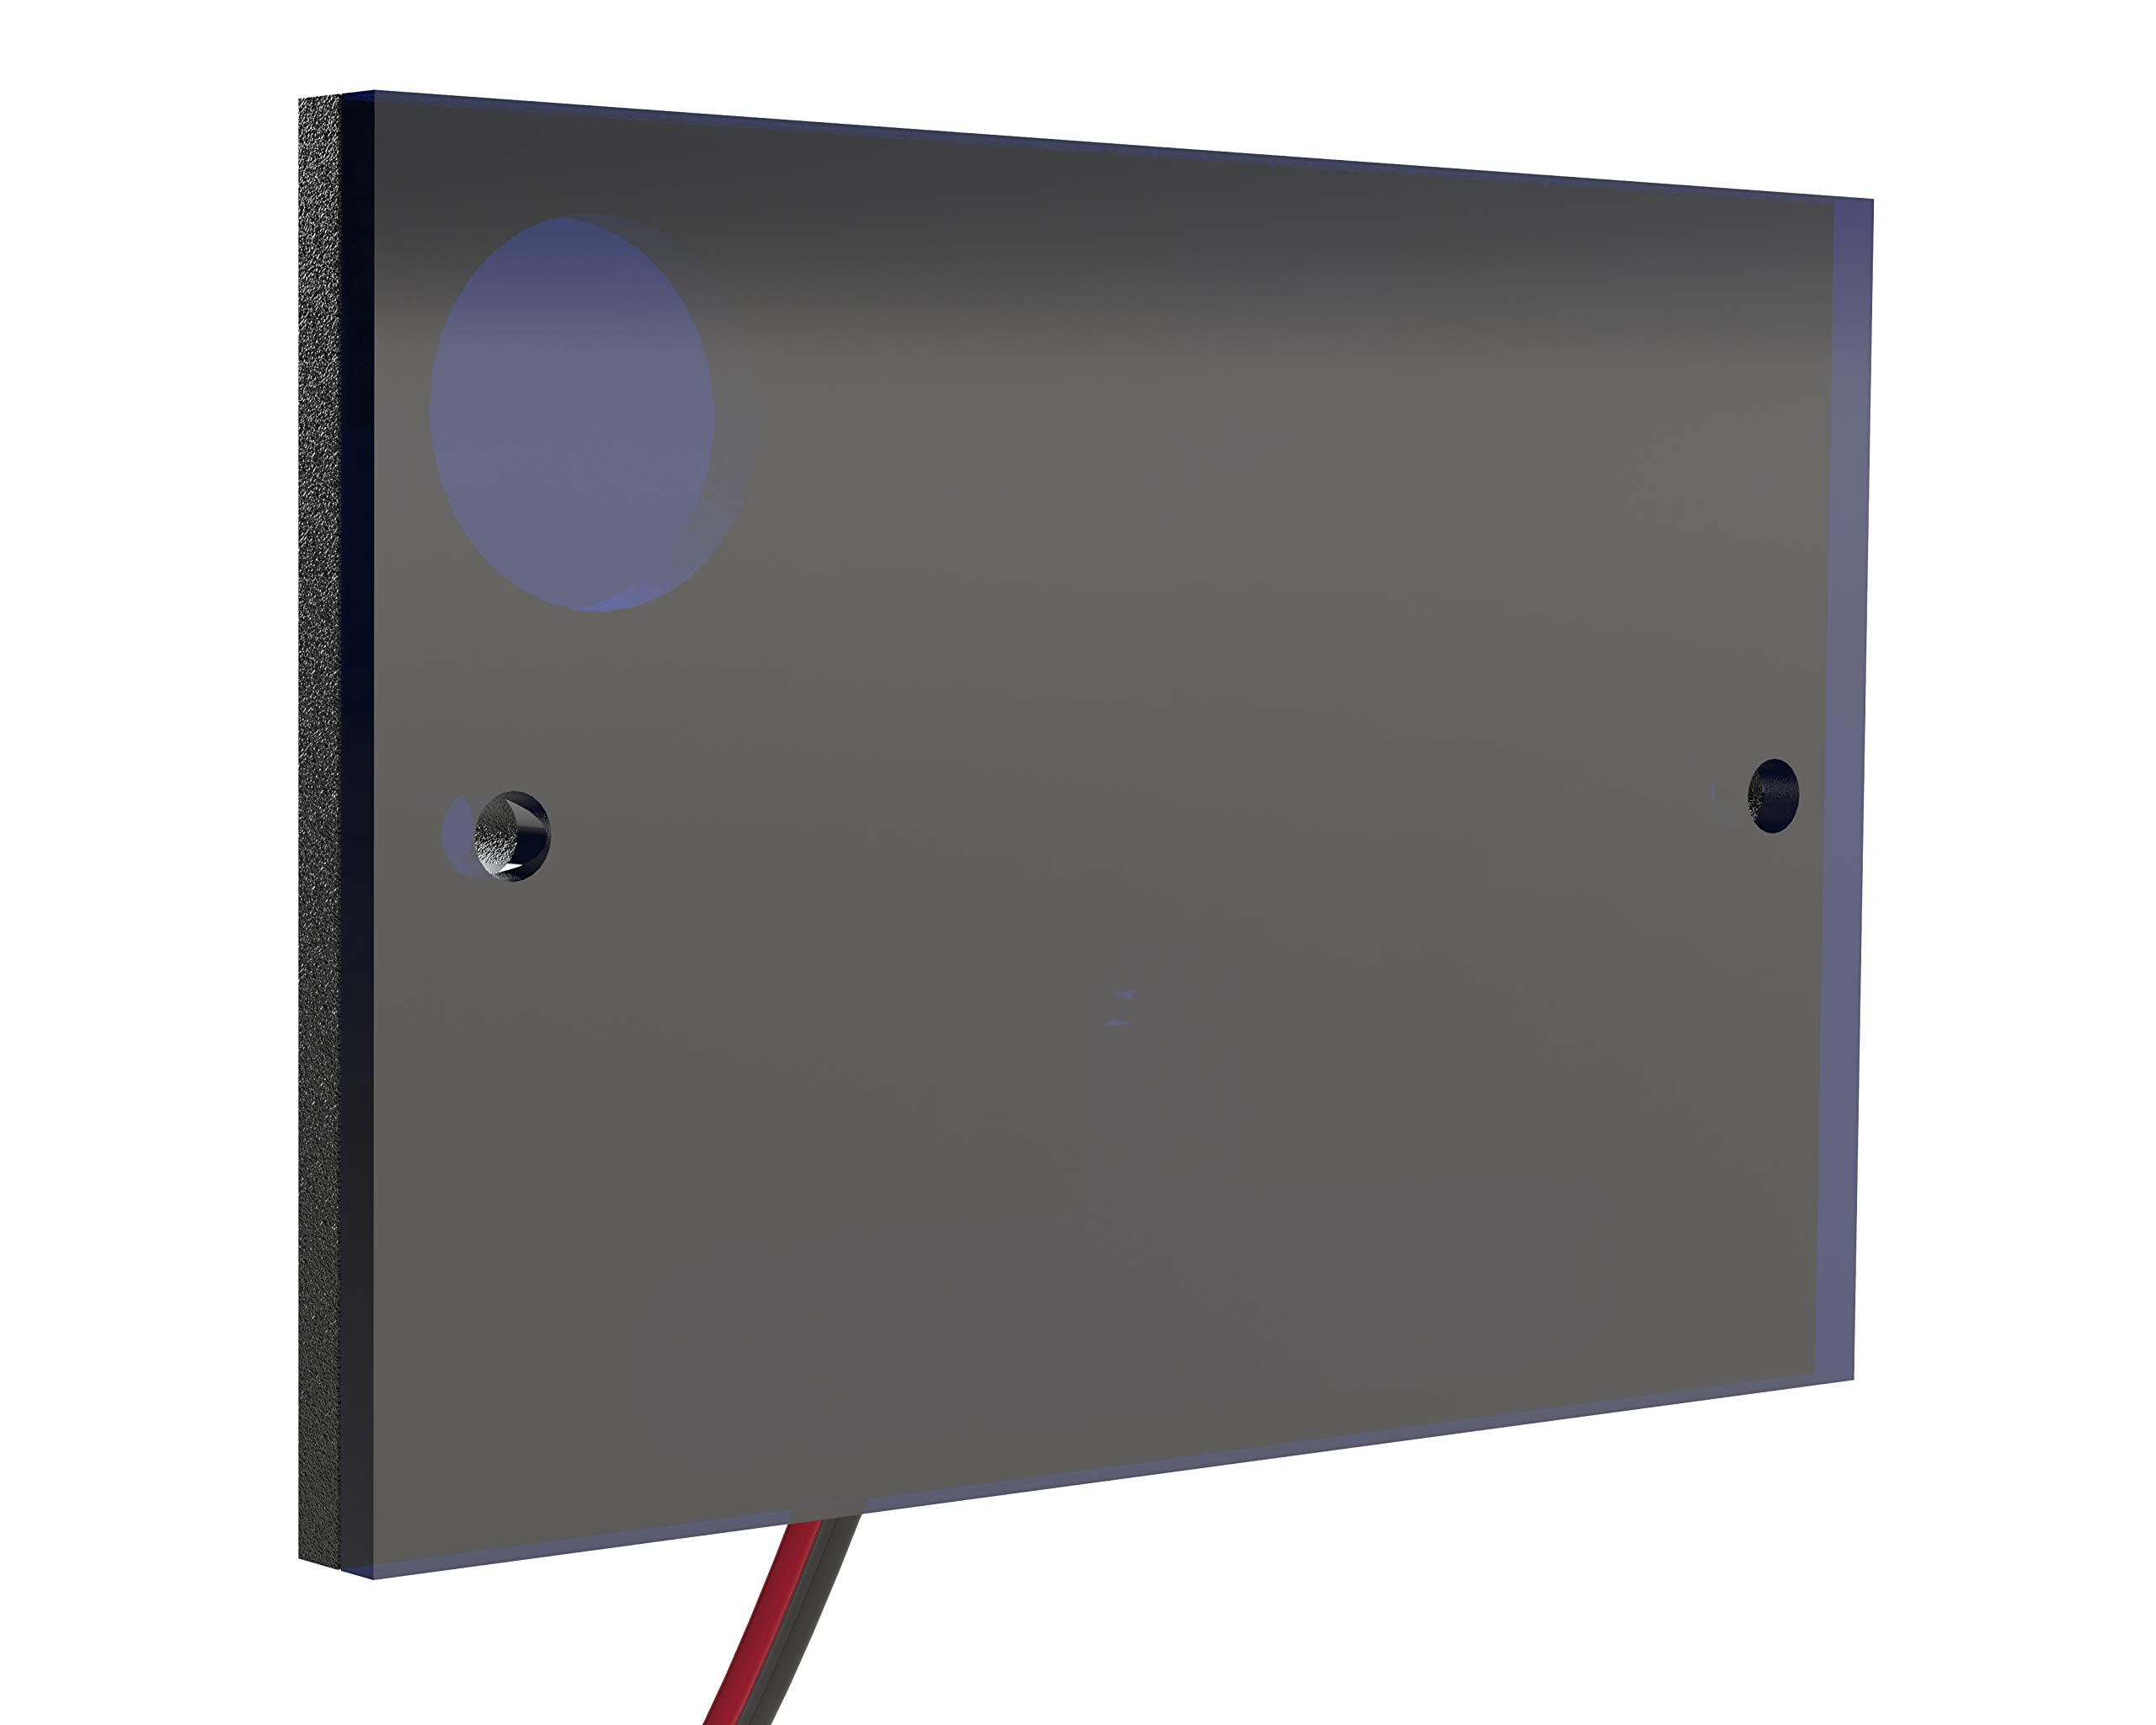 Infrared Illuminator Microlight IR Plate 120/8 120deg Wide Angle up to 25ft Night Vision by Microlight